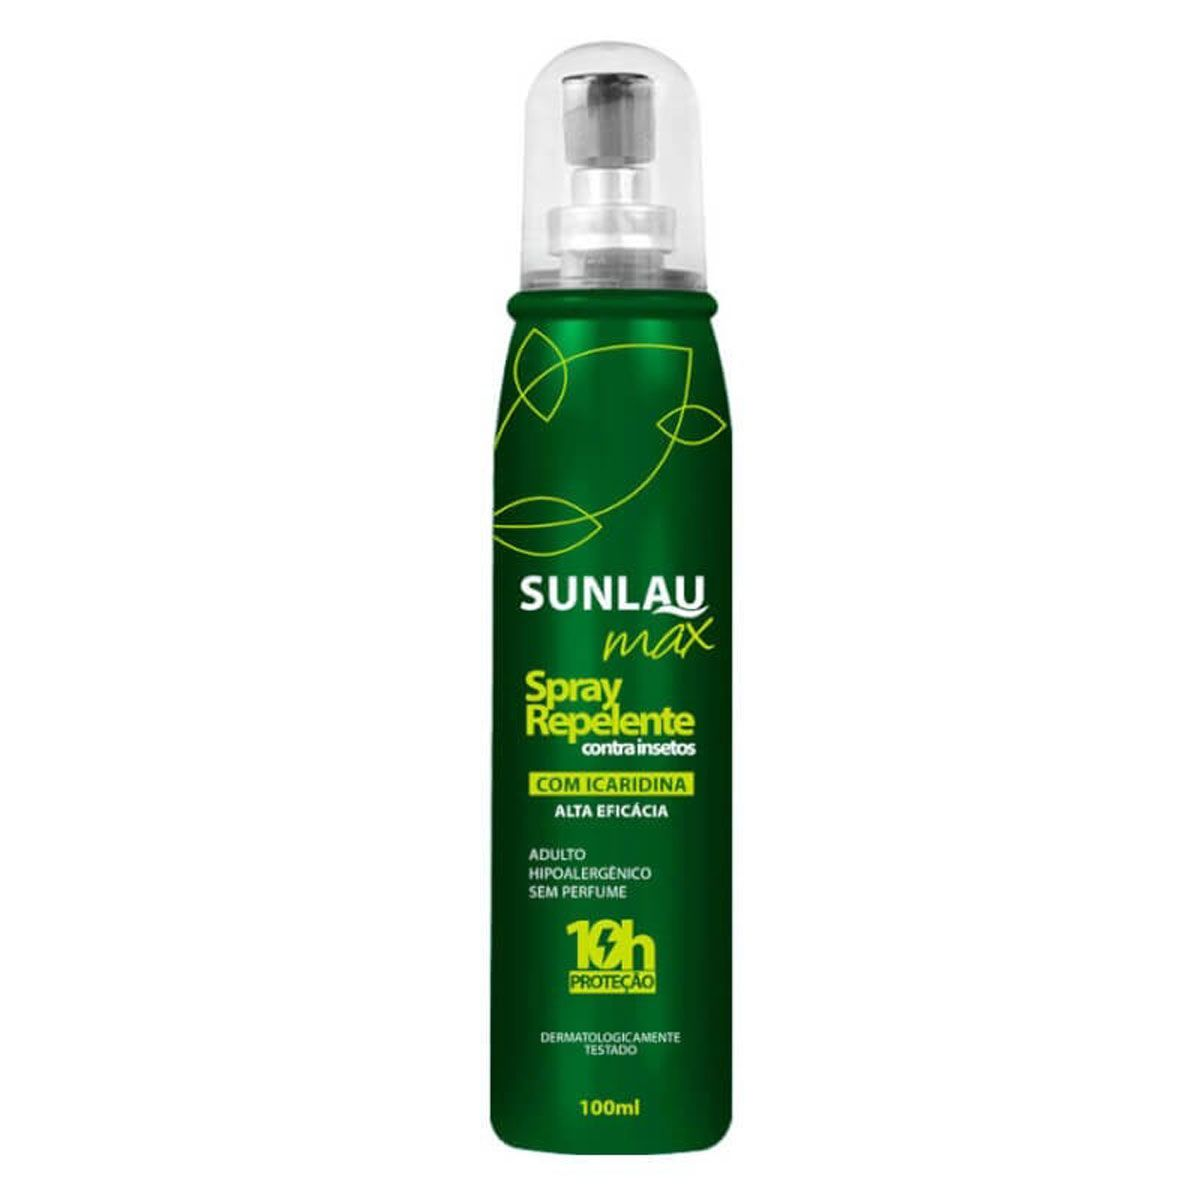 Repelente Spay Sunlau Max - 100ML